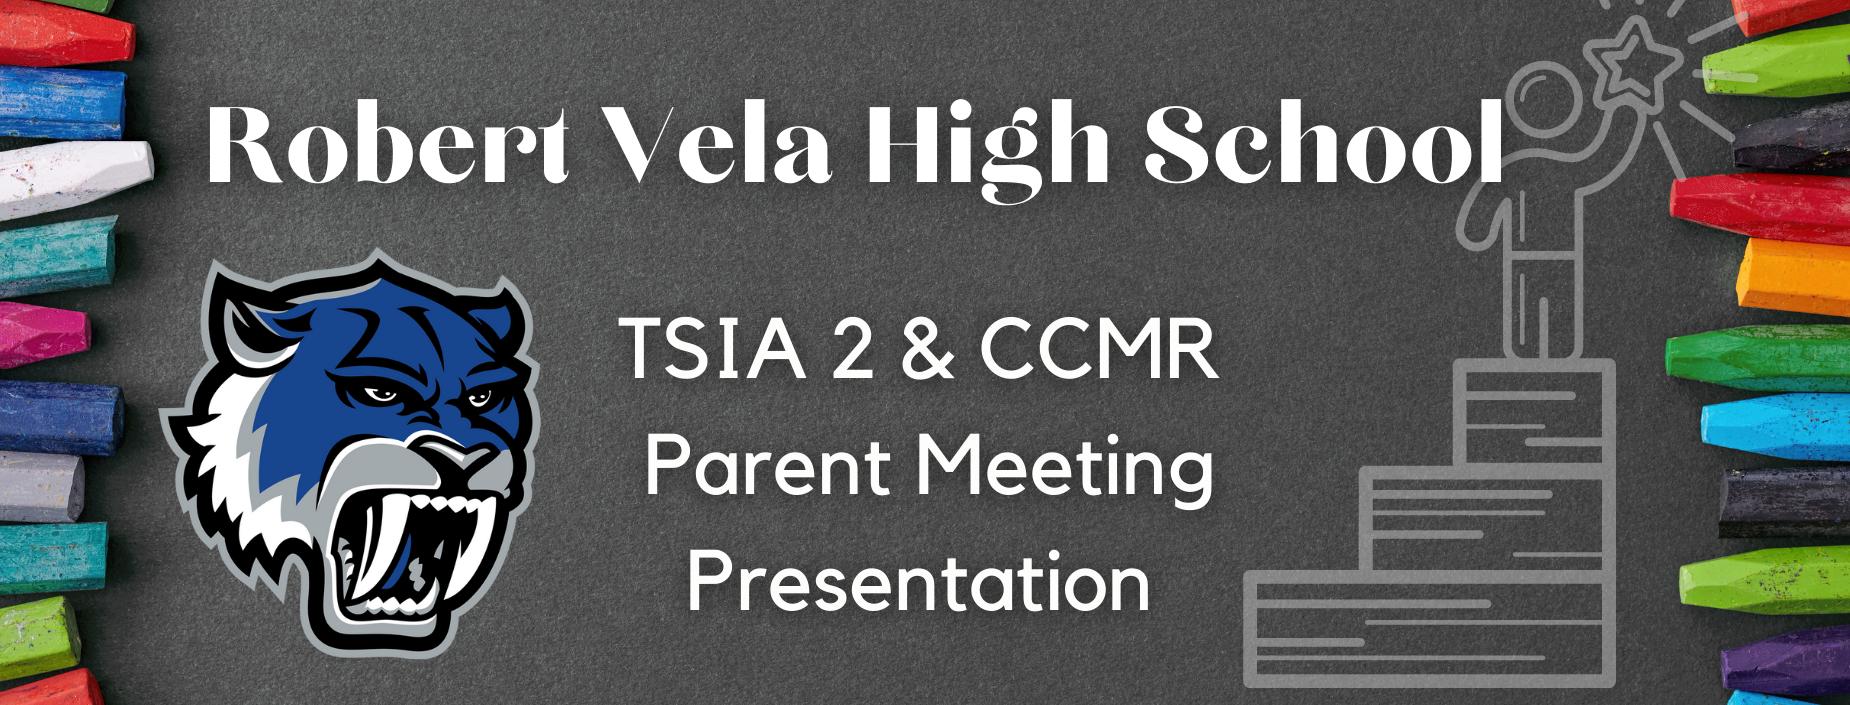 Parent Meeting Resources